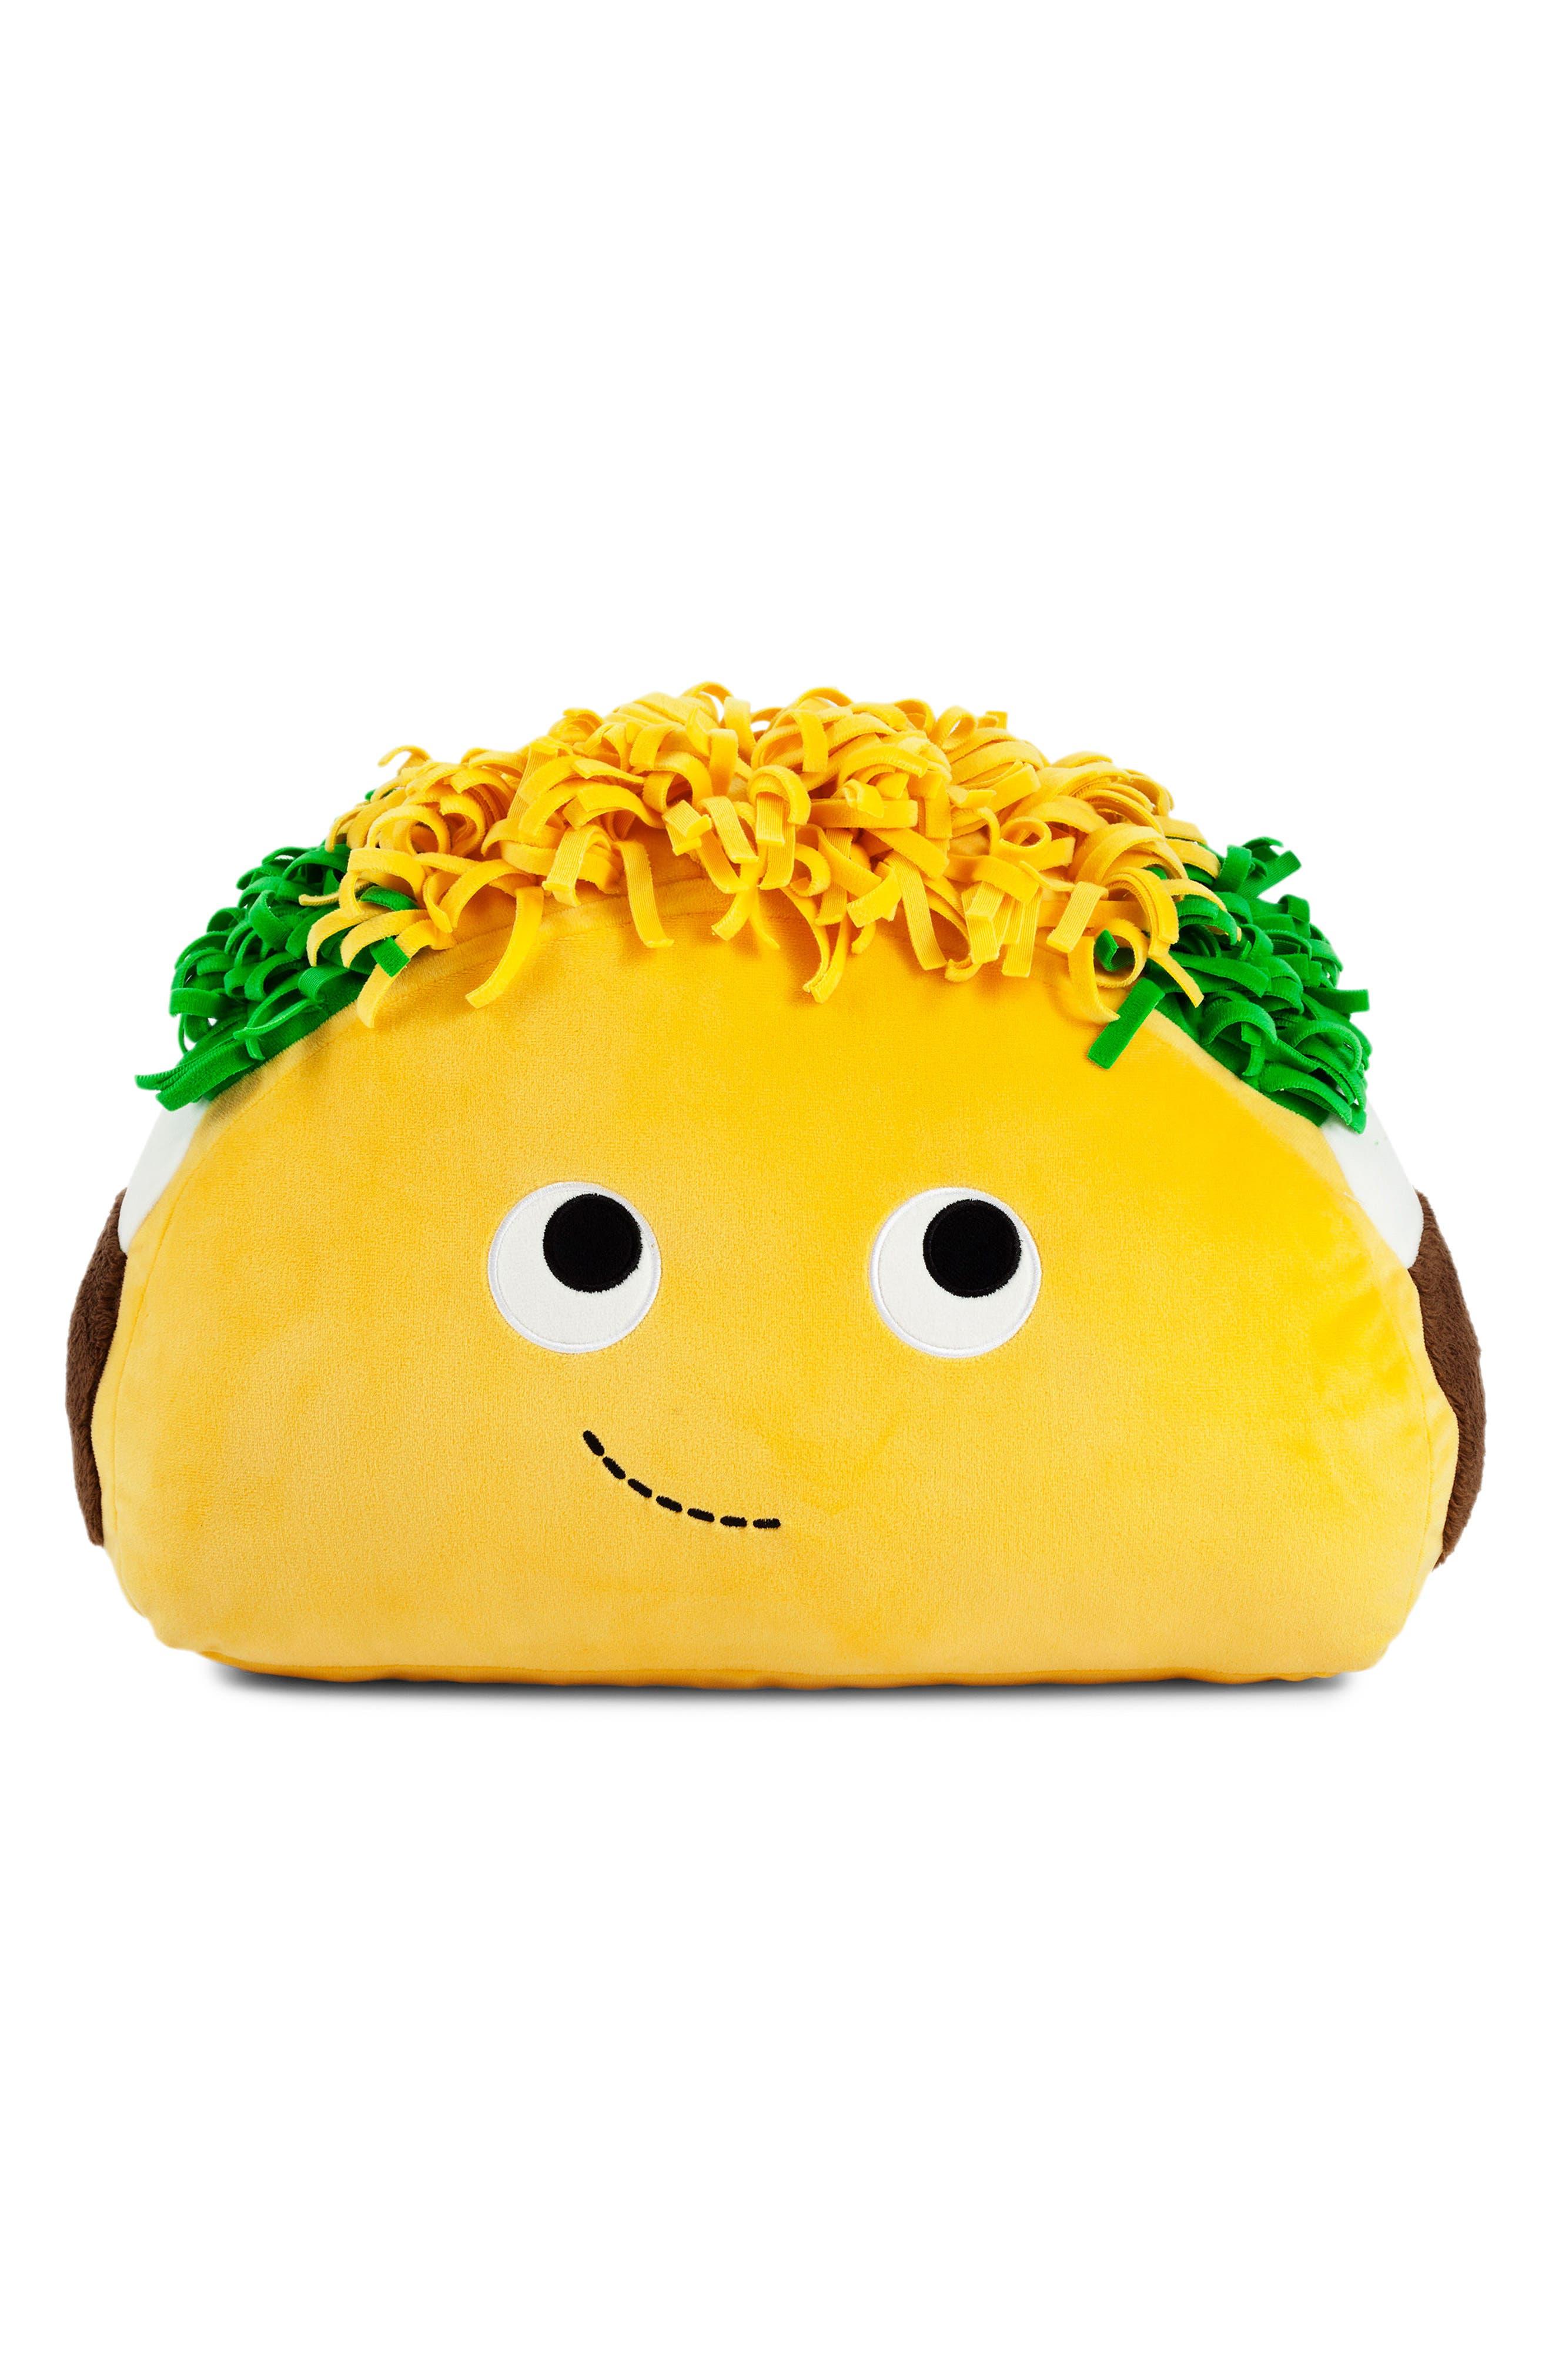 Yummy World Large Flaco Taco Plush Toy,                             Main thumbnail 1, color,                             No Color